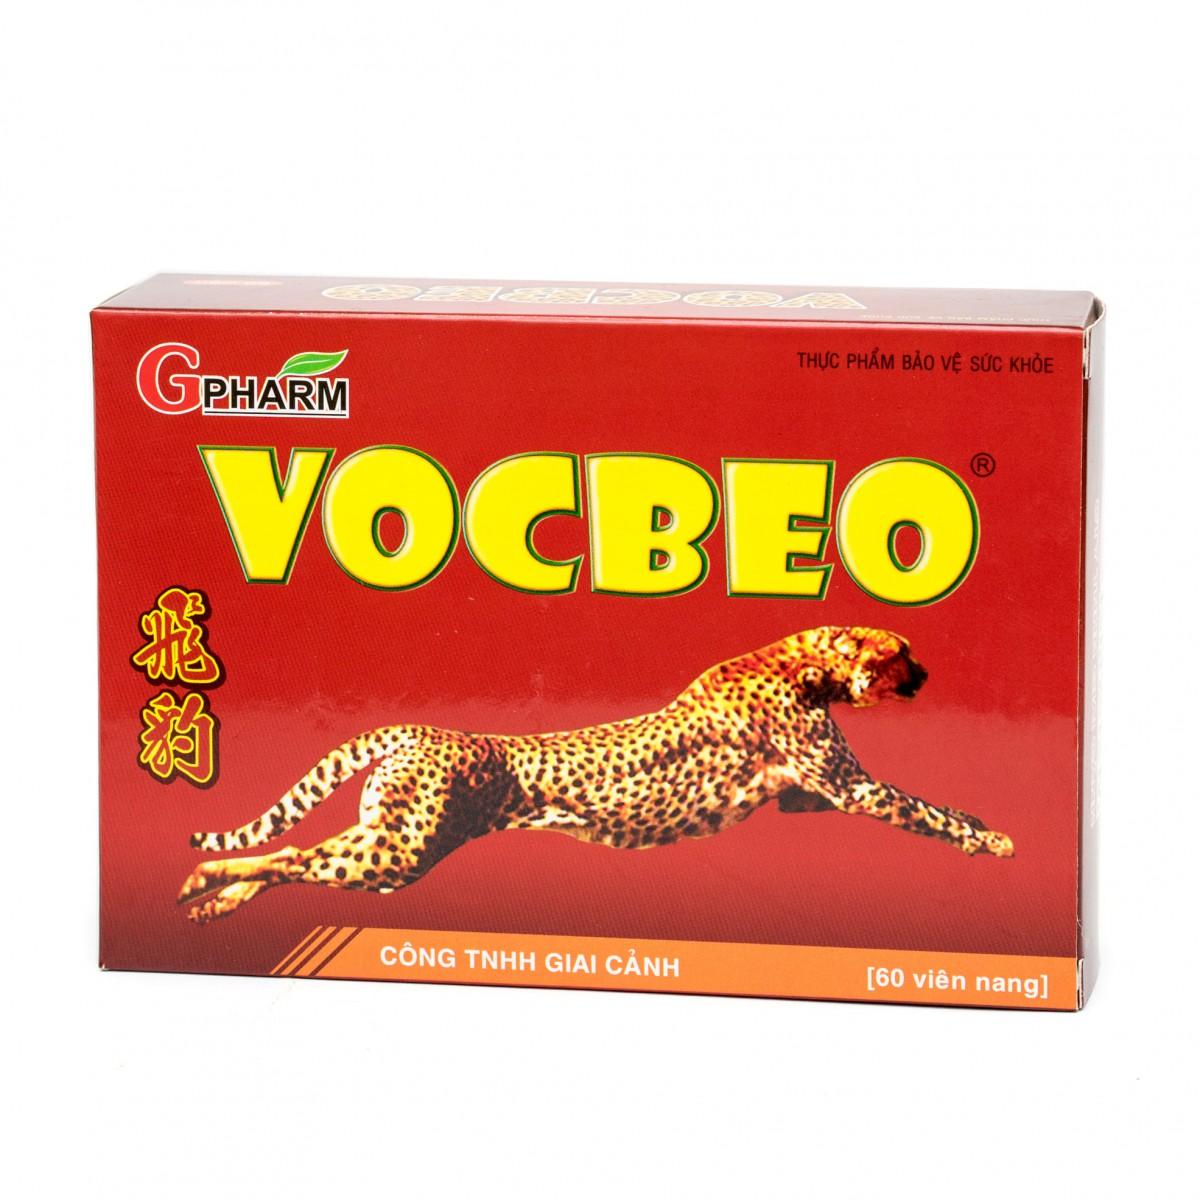 Vocbeo - Khớp dẻo dai, xương chắc khỏe